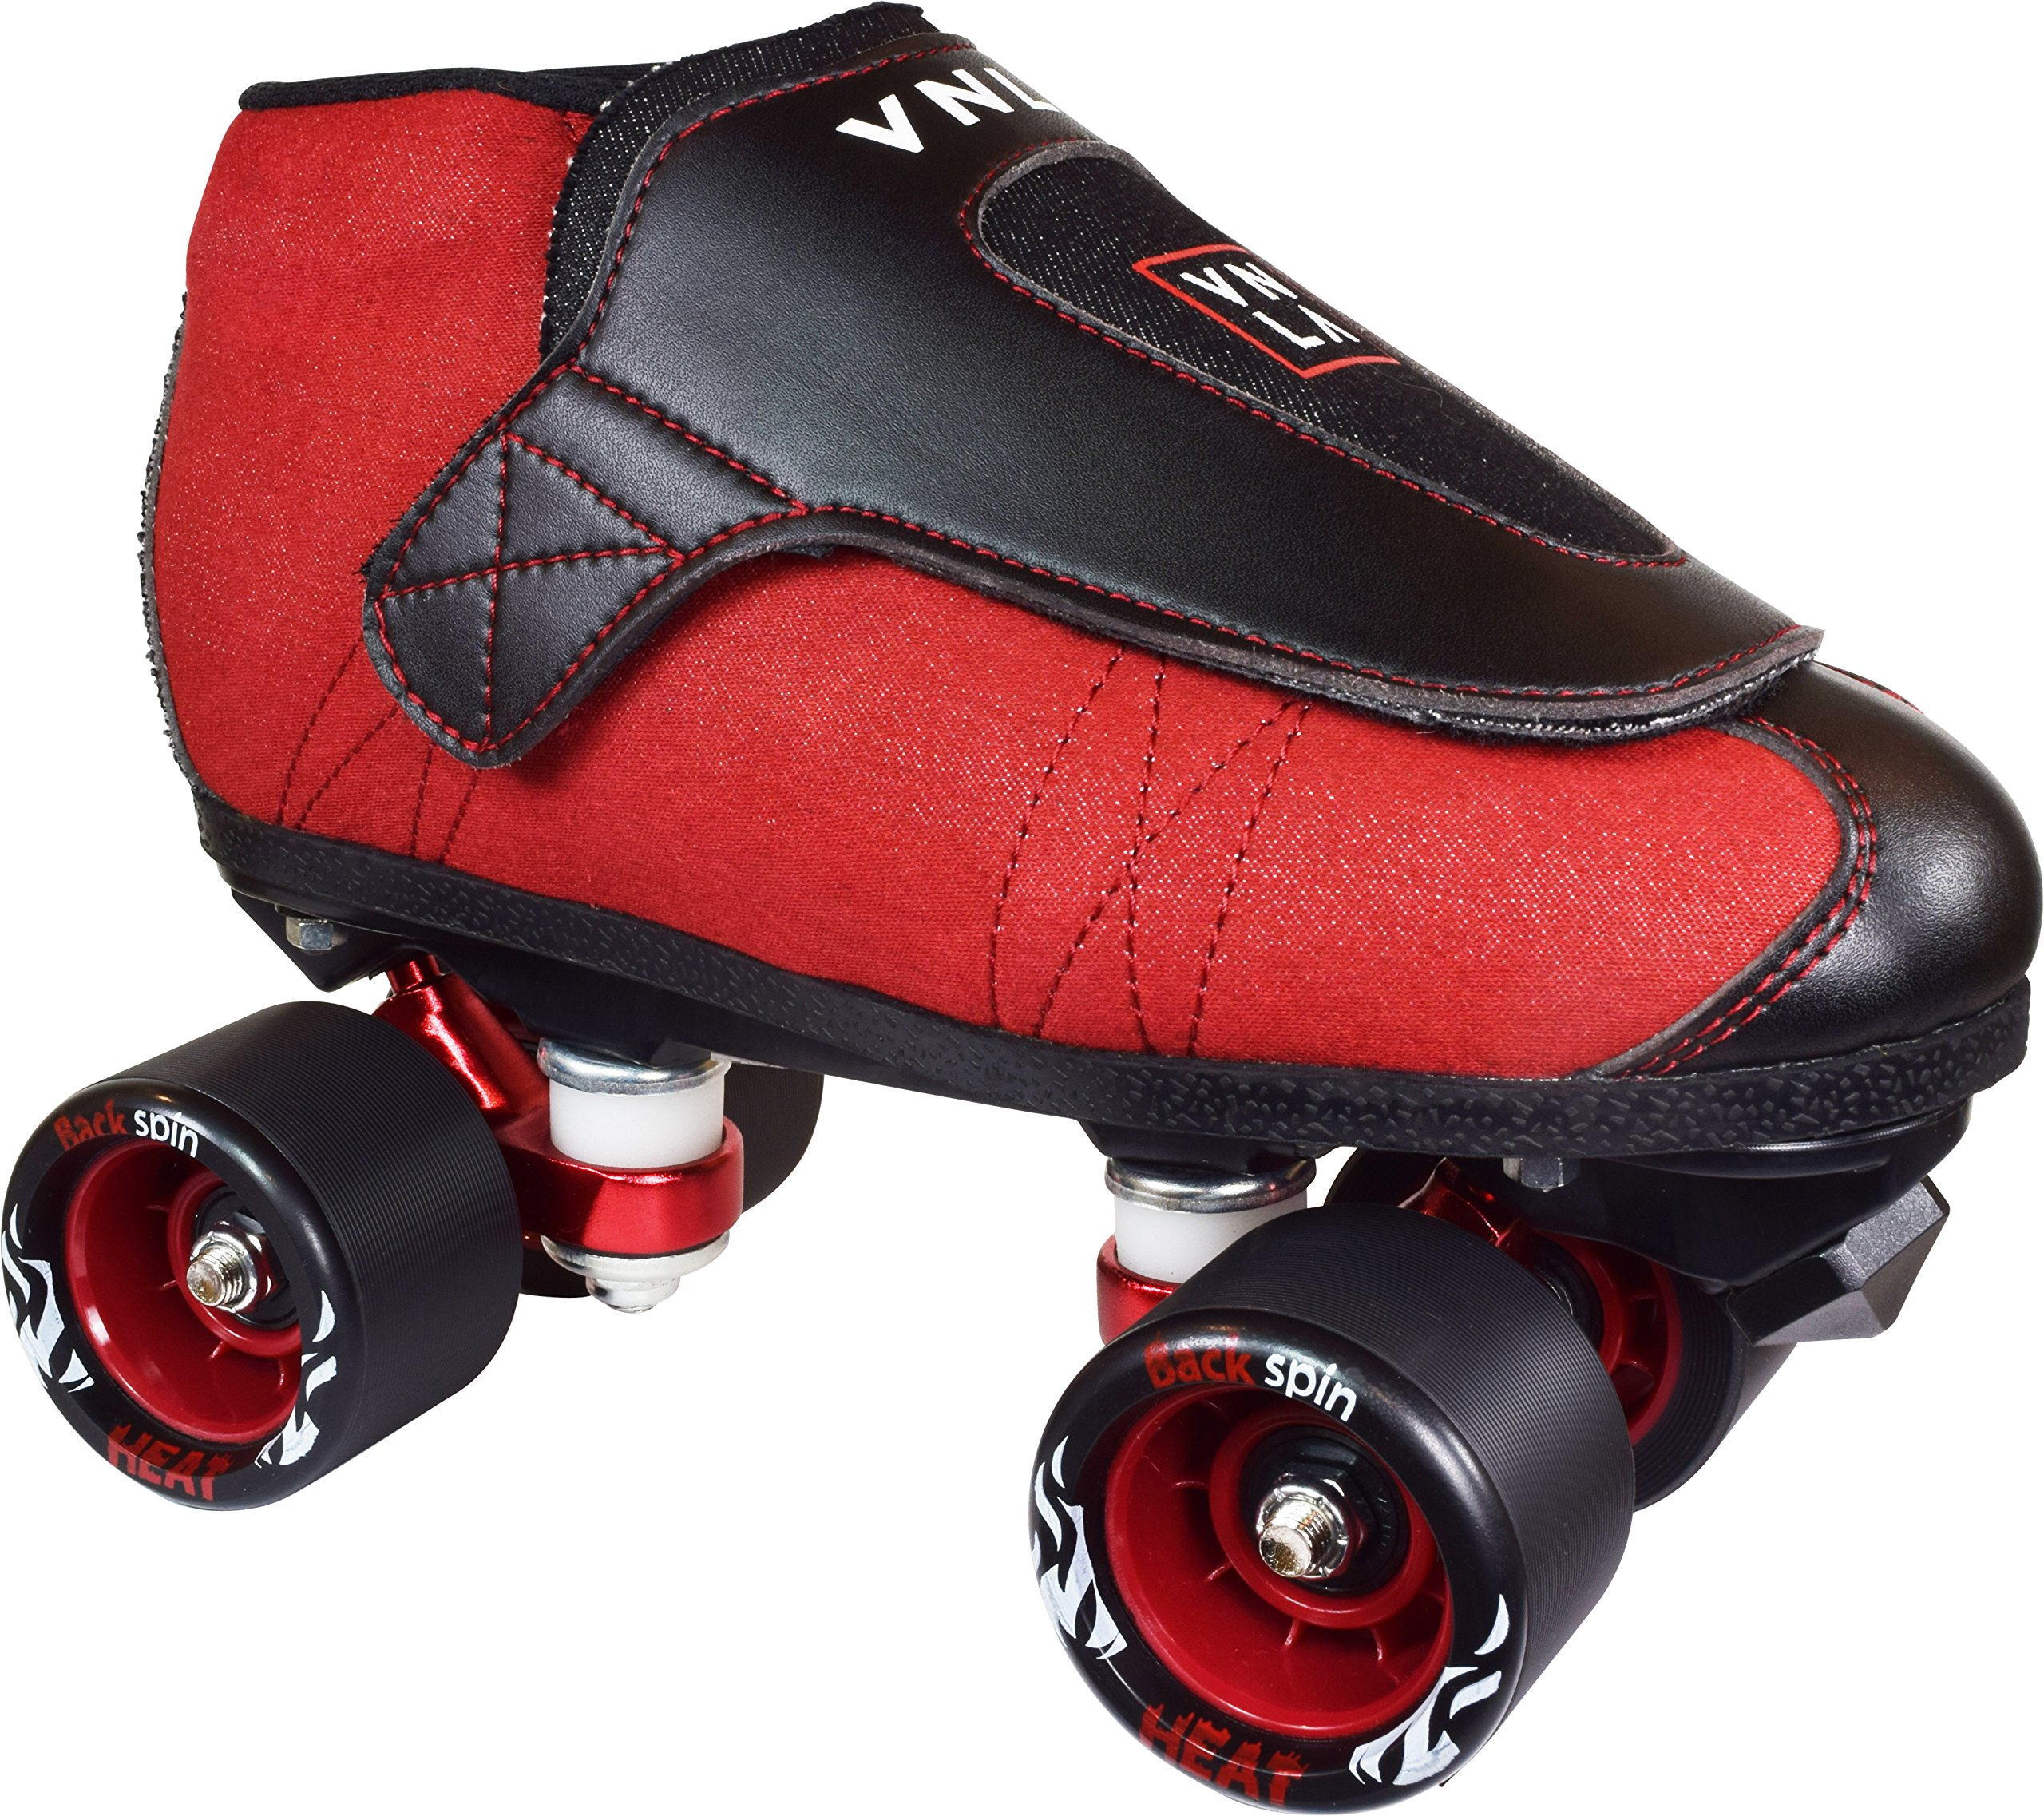 VNLA Code Red Jam Skates | Quad Roller Skates from Vanilla - Indoor speed skates - Denim and Leather - for Tricks and Rhythm skating (Red and Black)